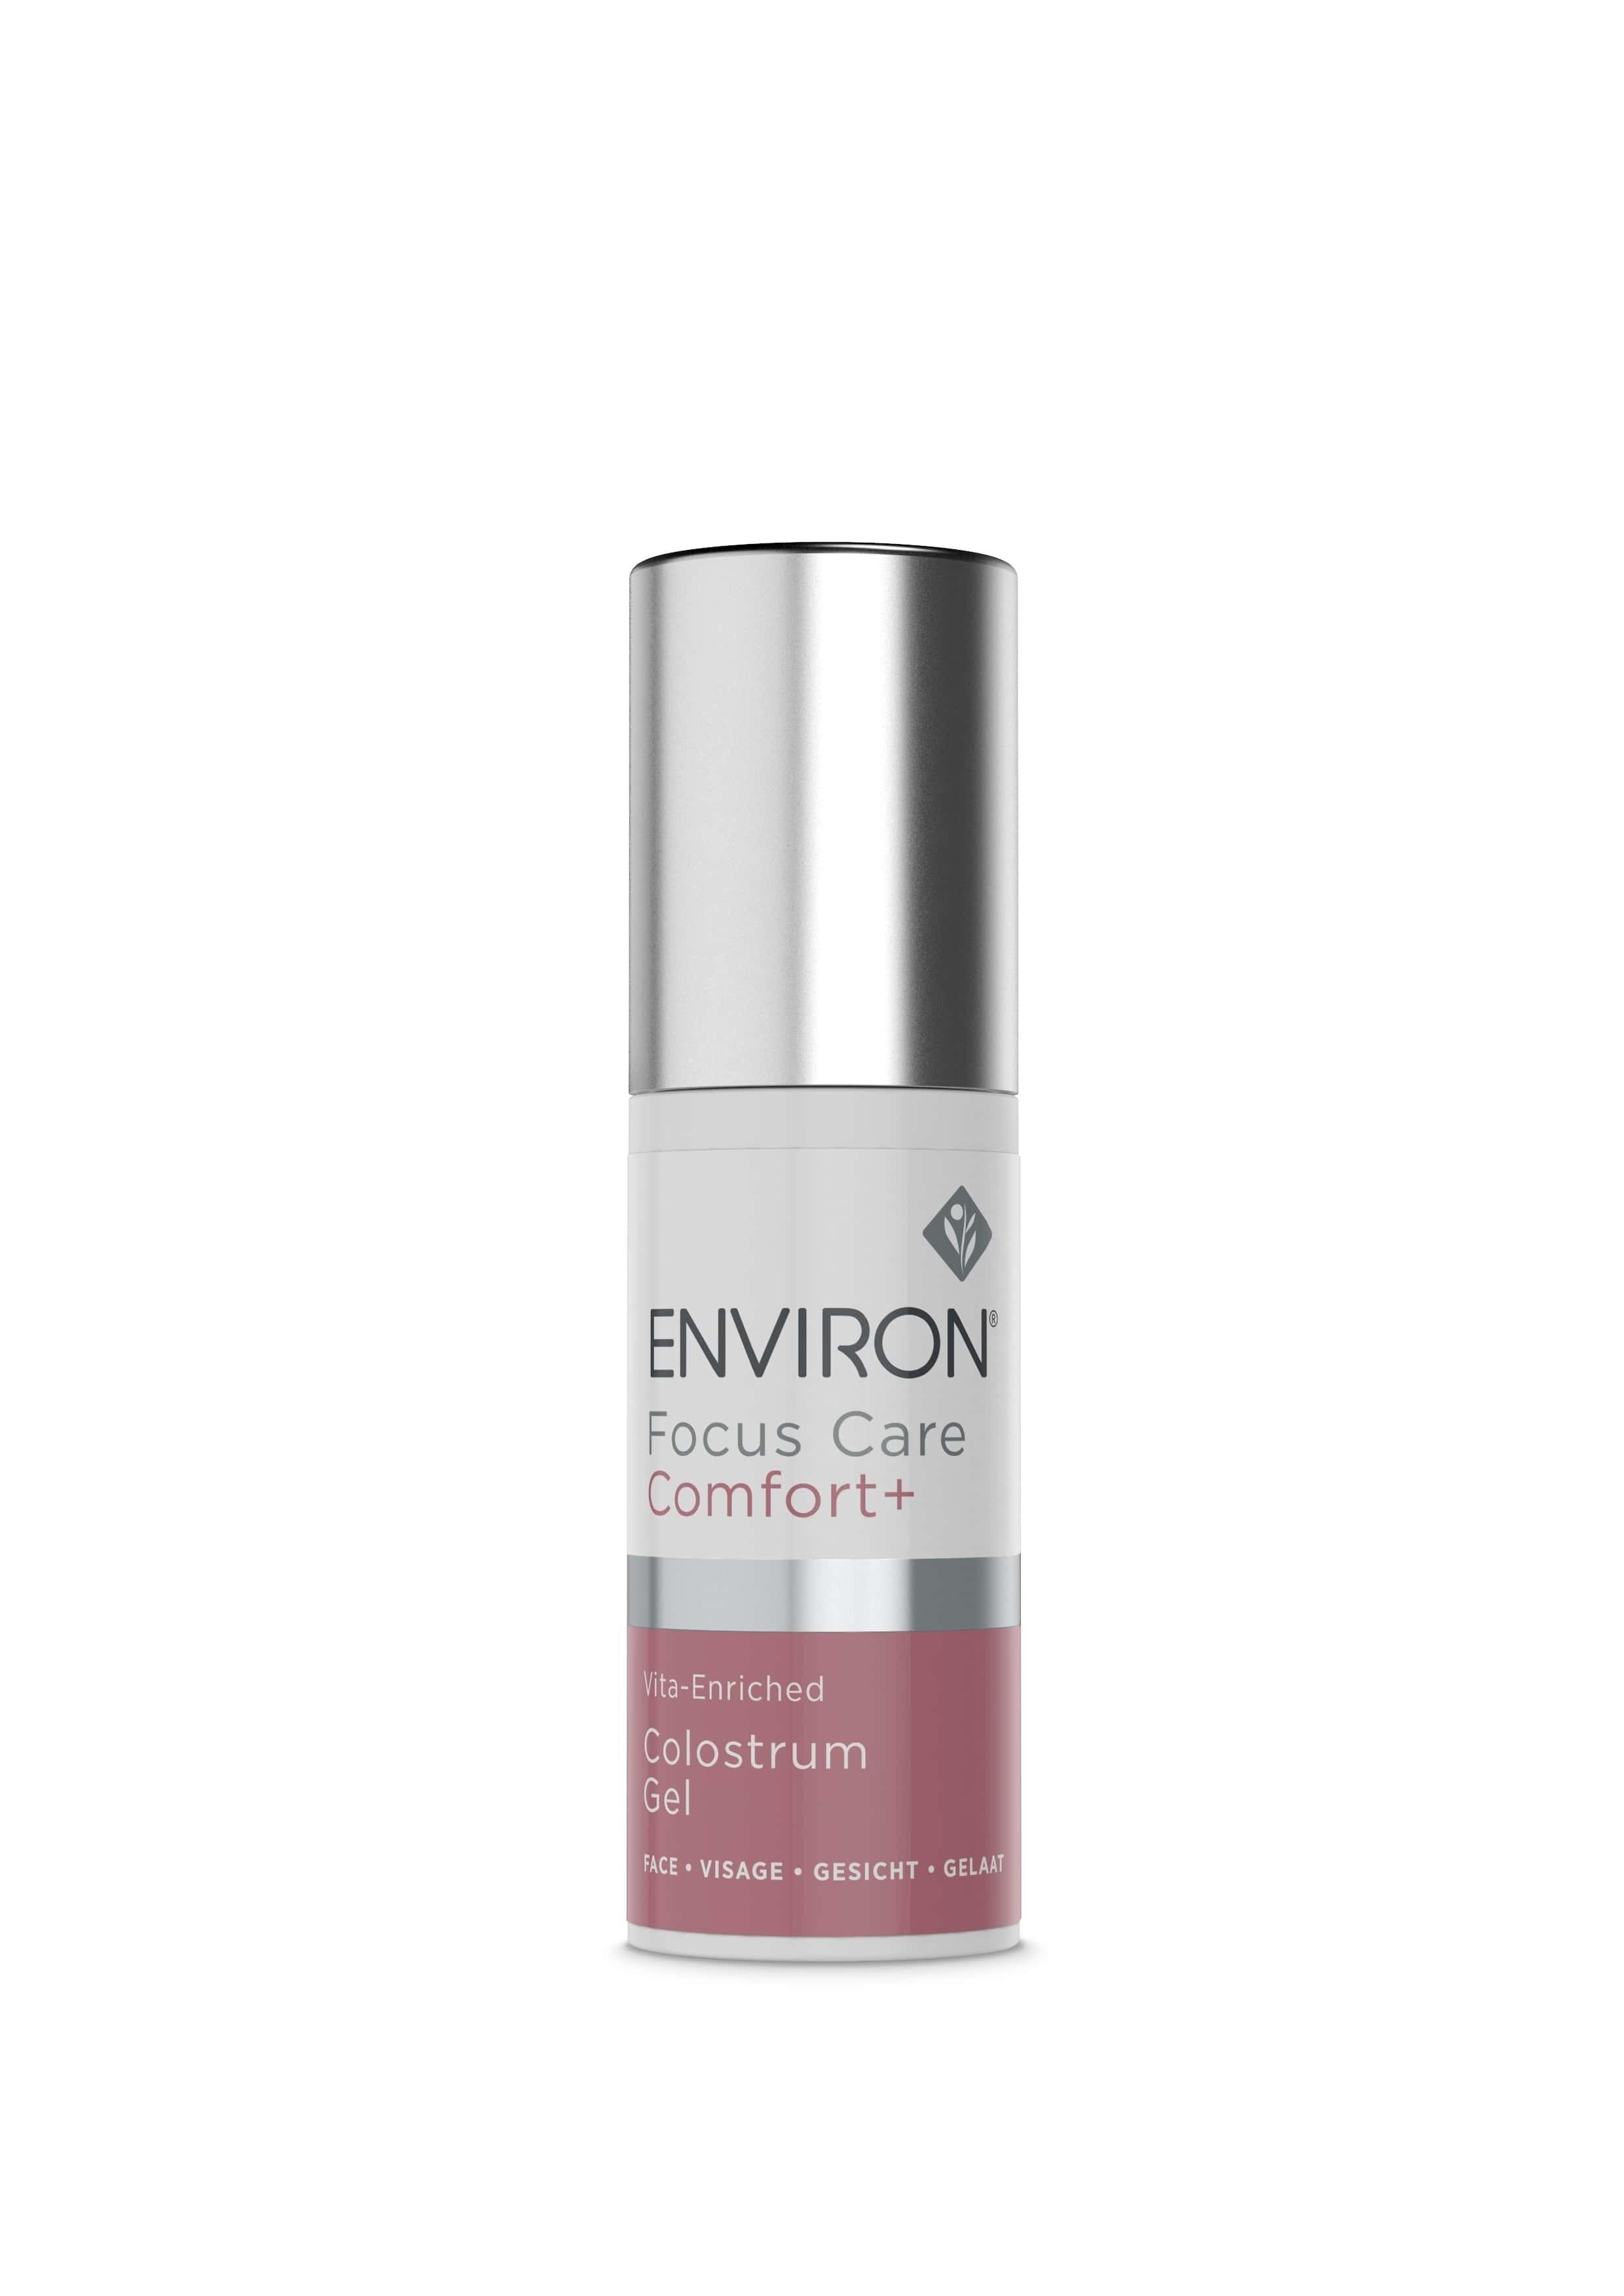 Environ Focus Care Comfort+ Vita-Enriched Colostrum Gel 30ml